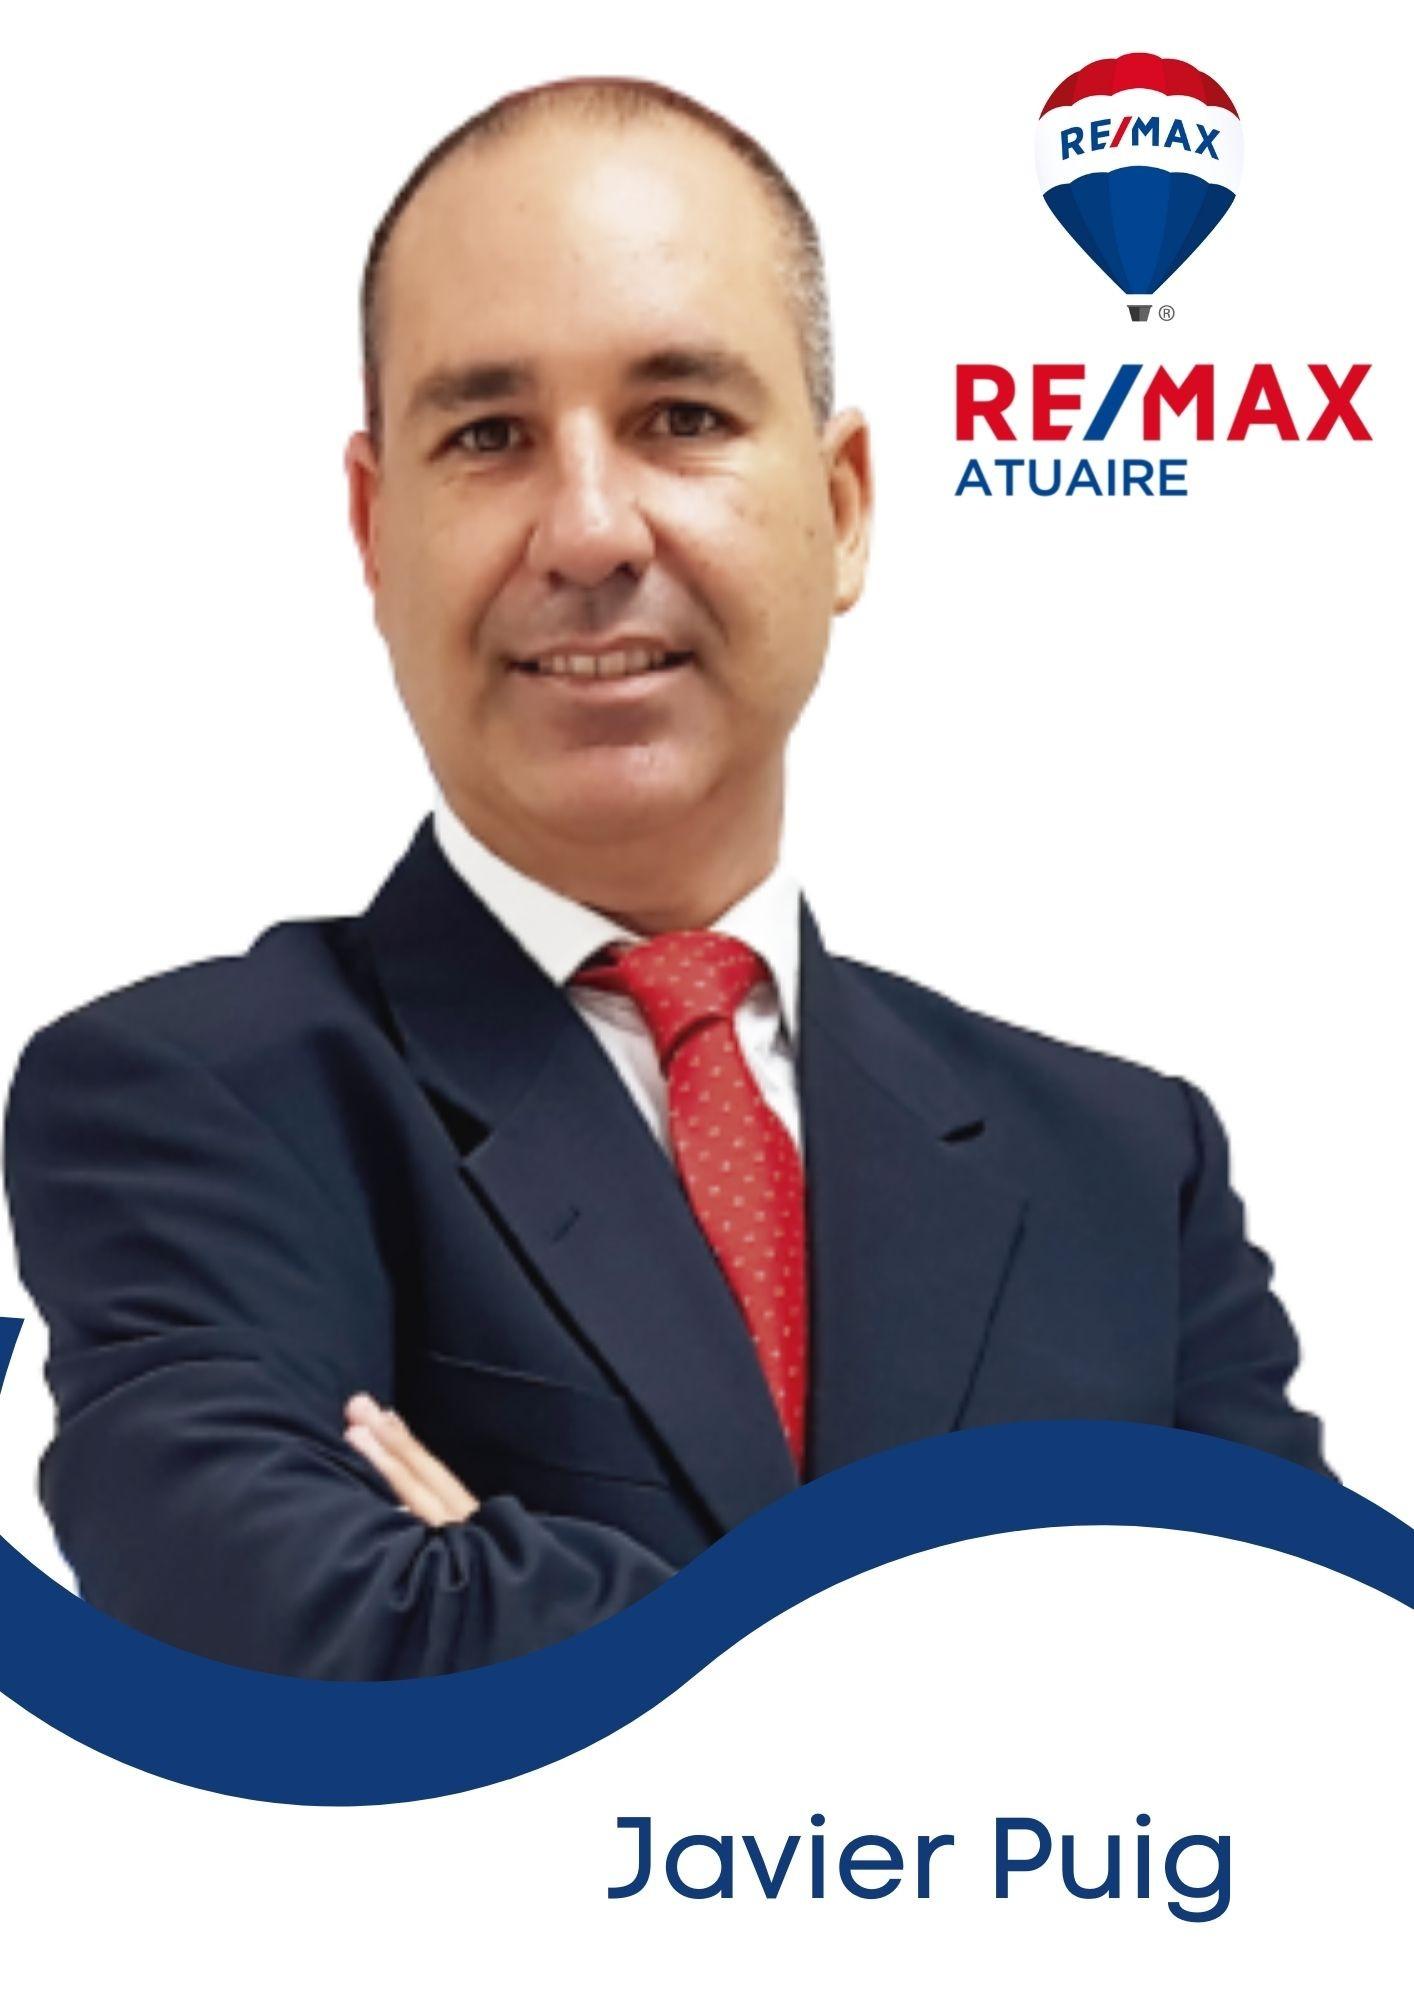 Javier Puig Rodríguez